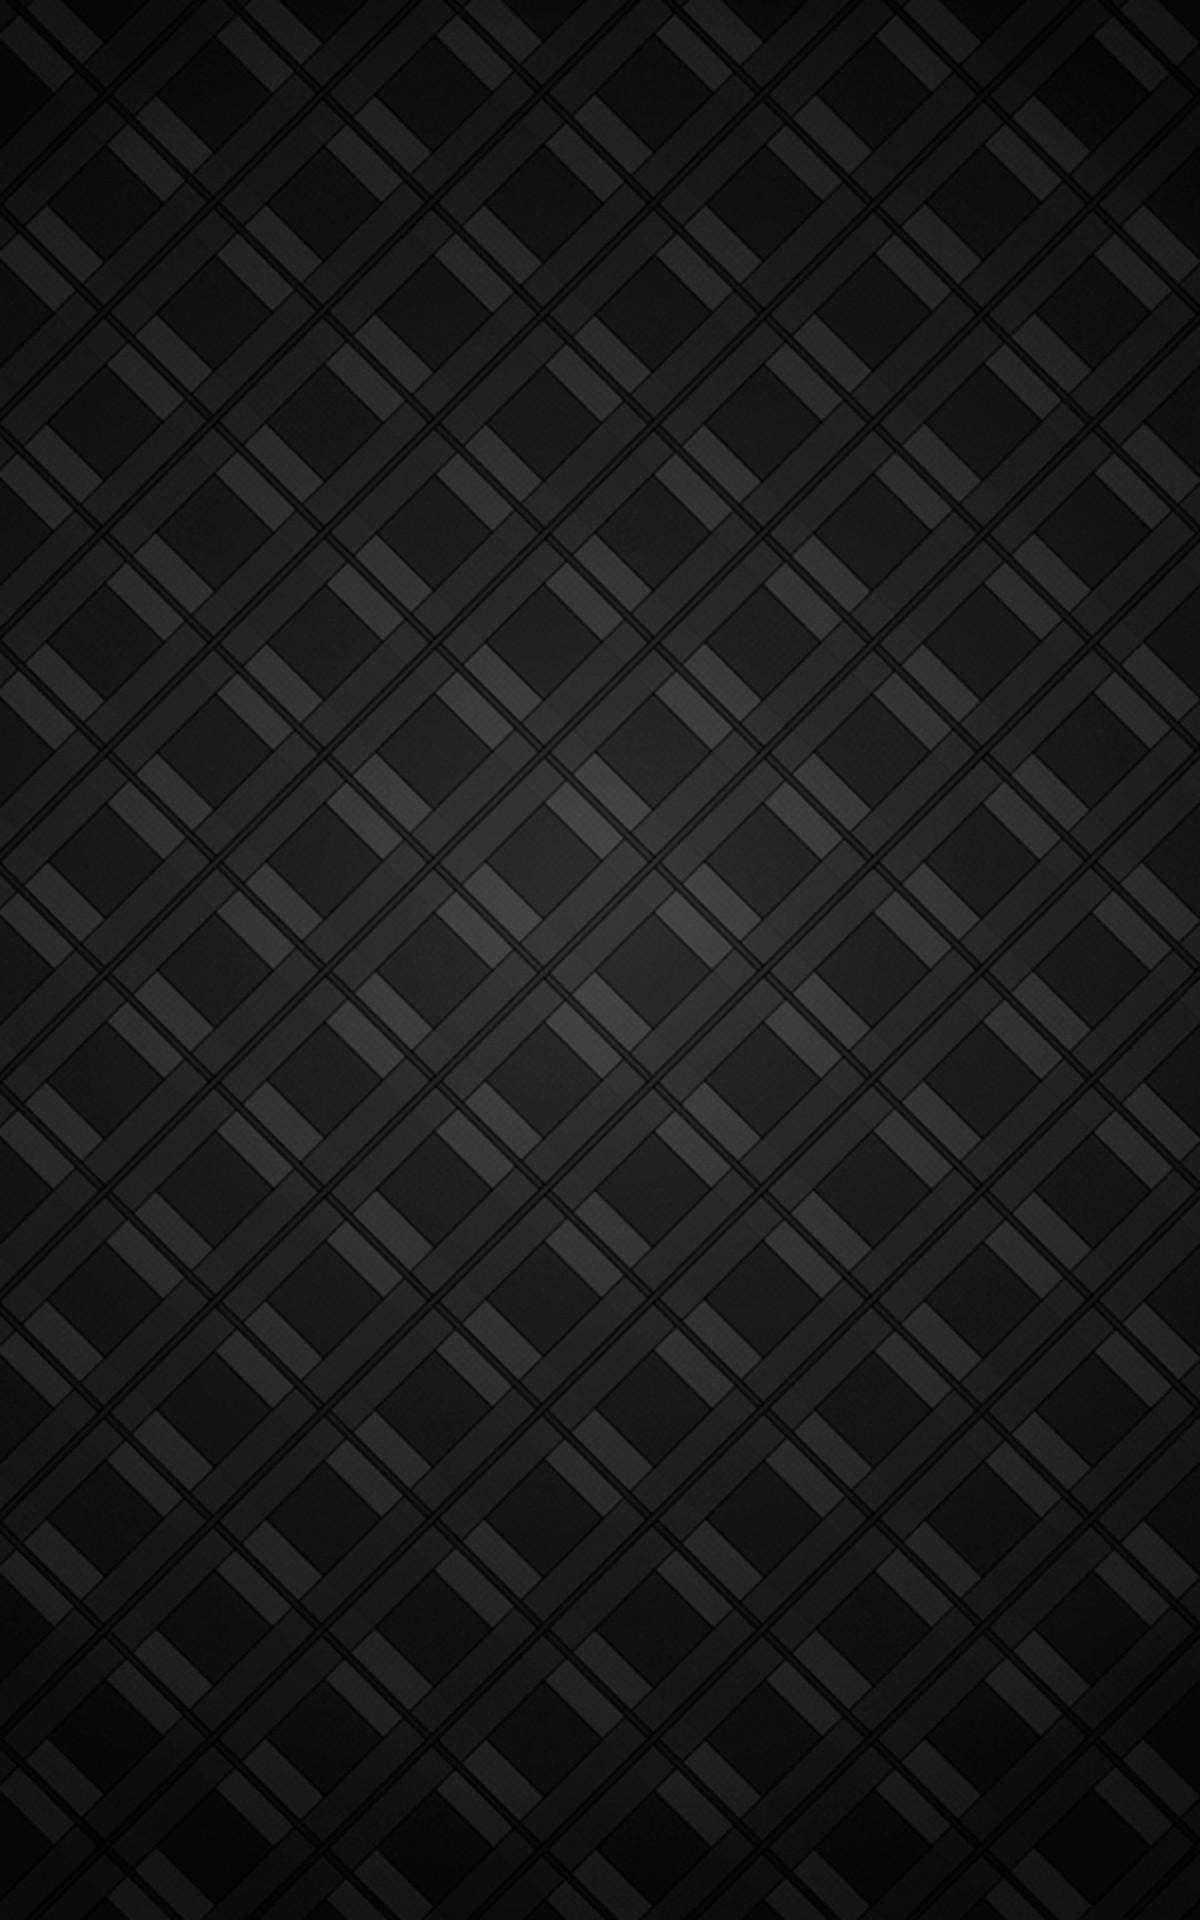 pattern monochrome minimalism digital art 257314